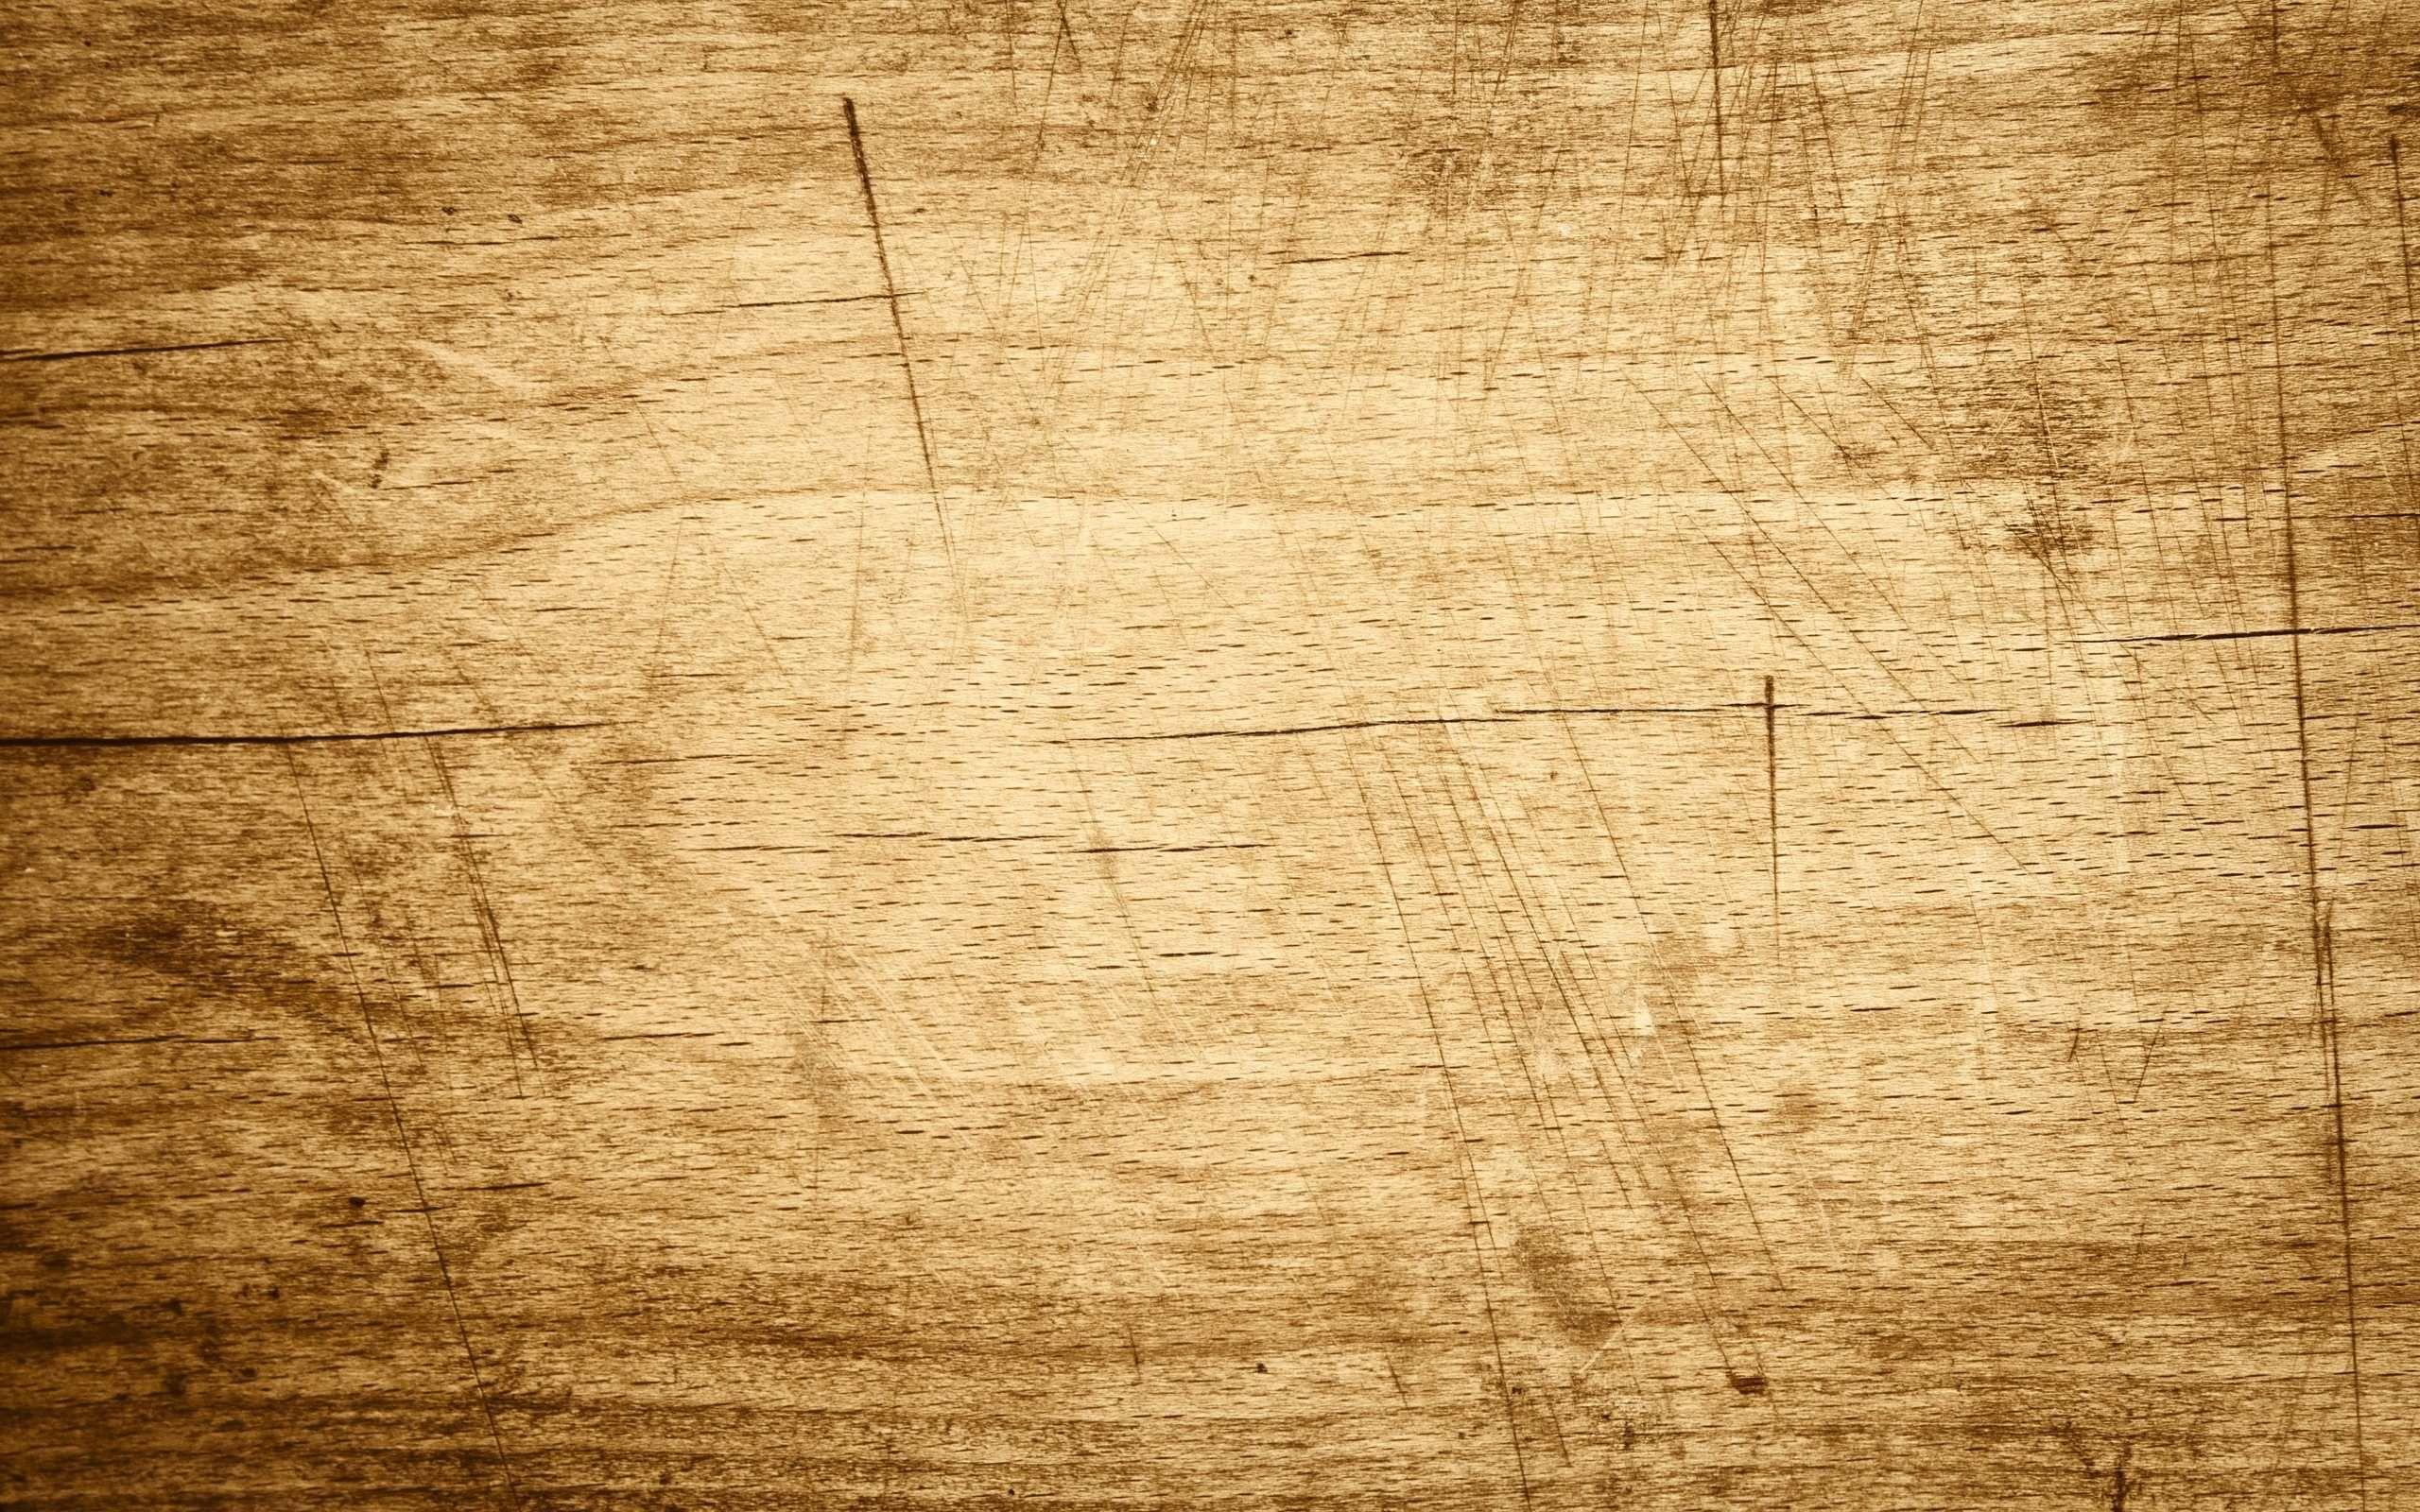 Light Wood Background Wallpaperjpg 25601600 Pixels